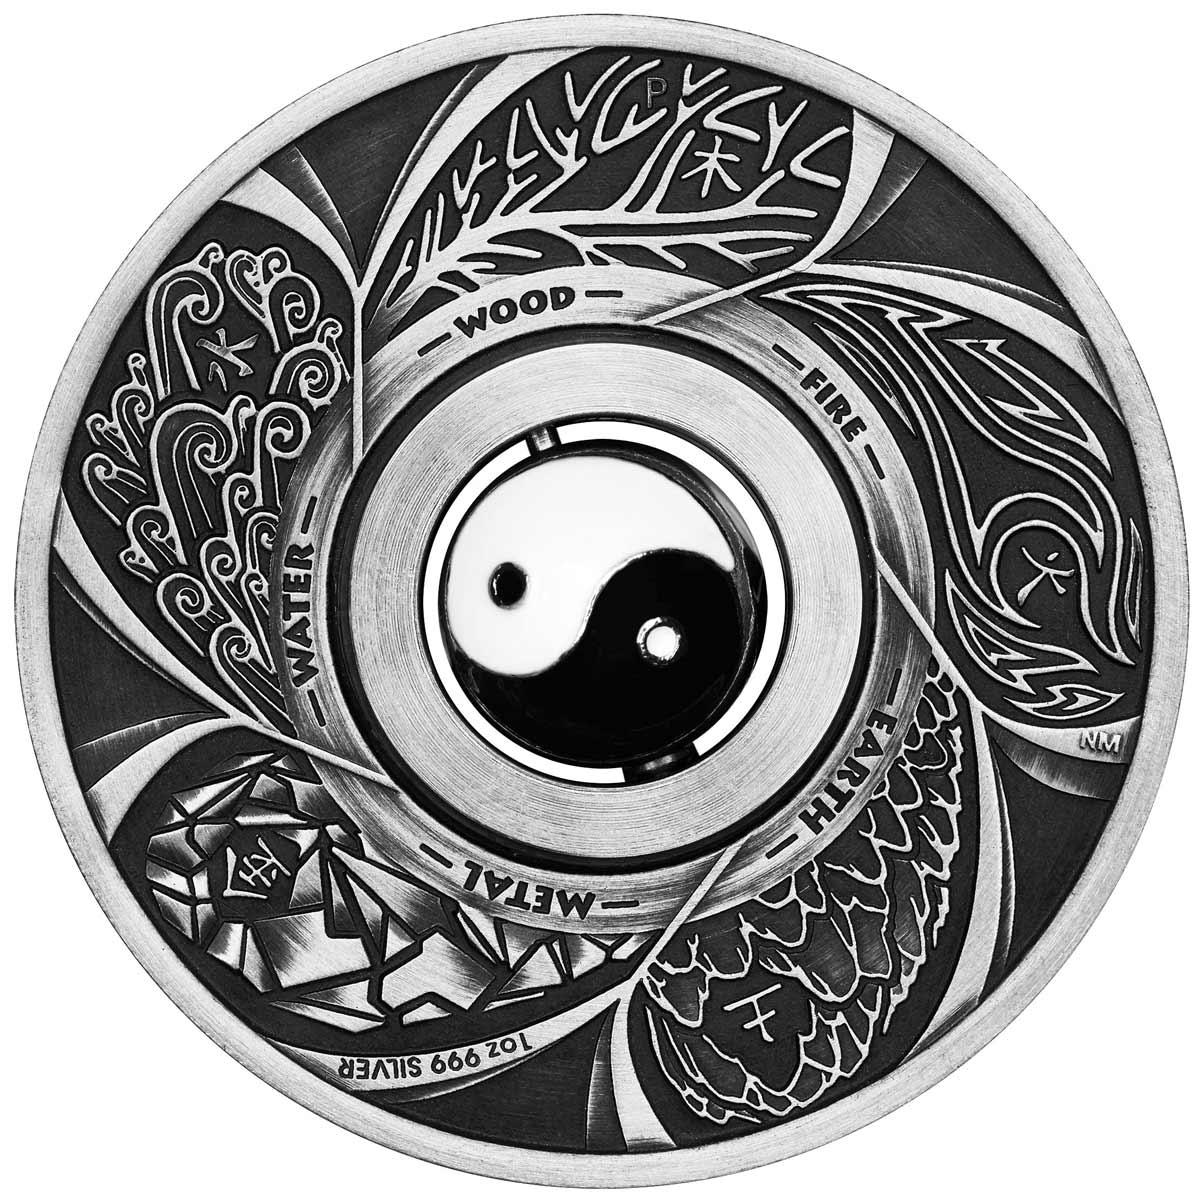 1200x1200 Rotating Yin Yang Symbols, Christmas And Dingos From The Perth